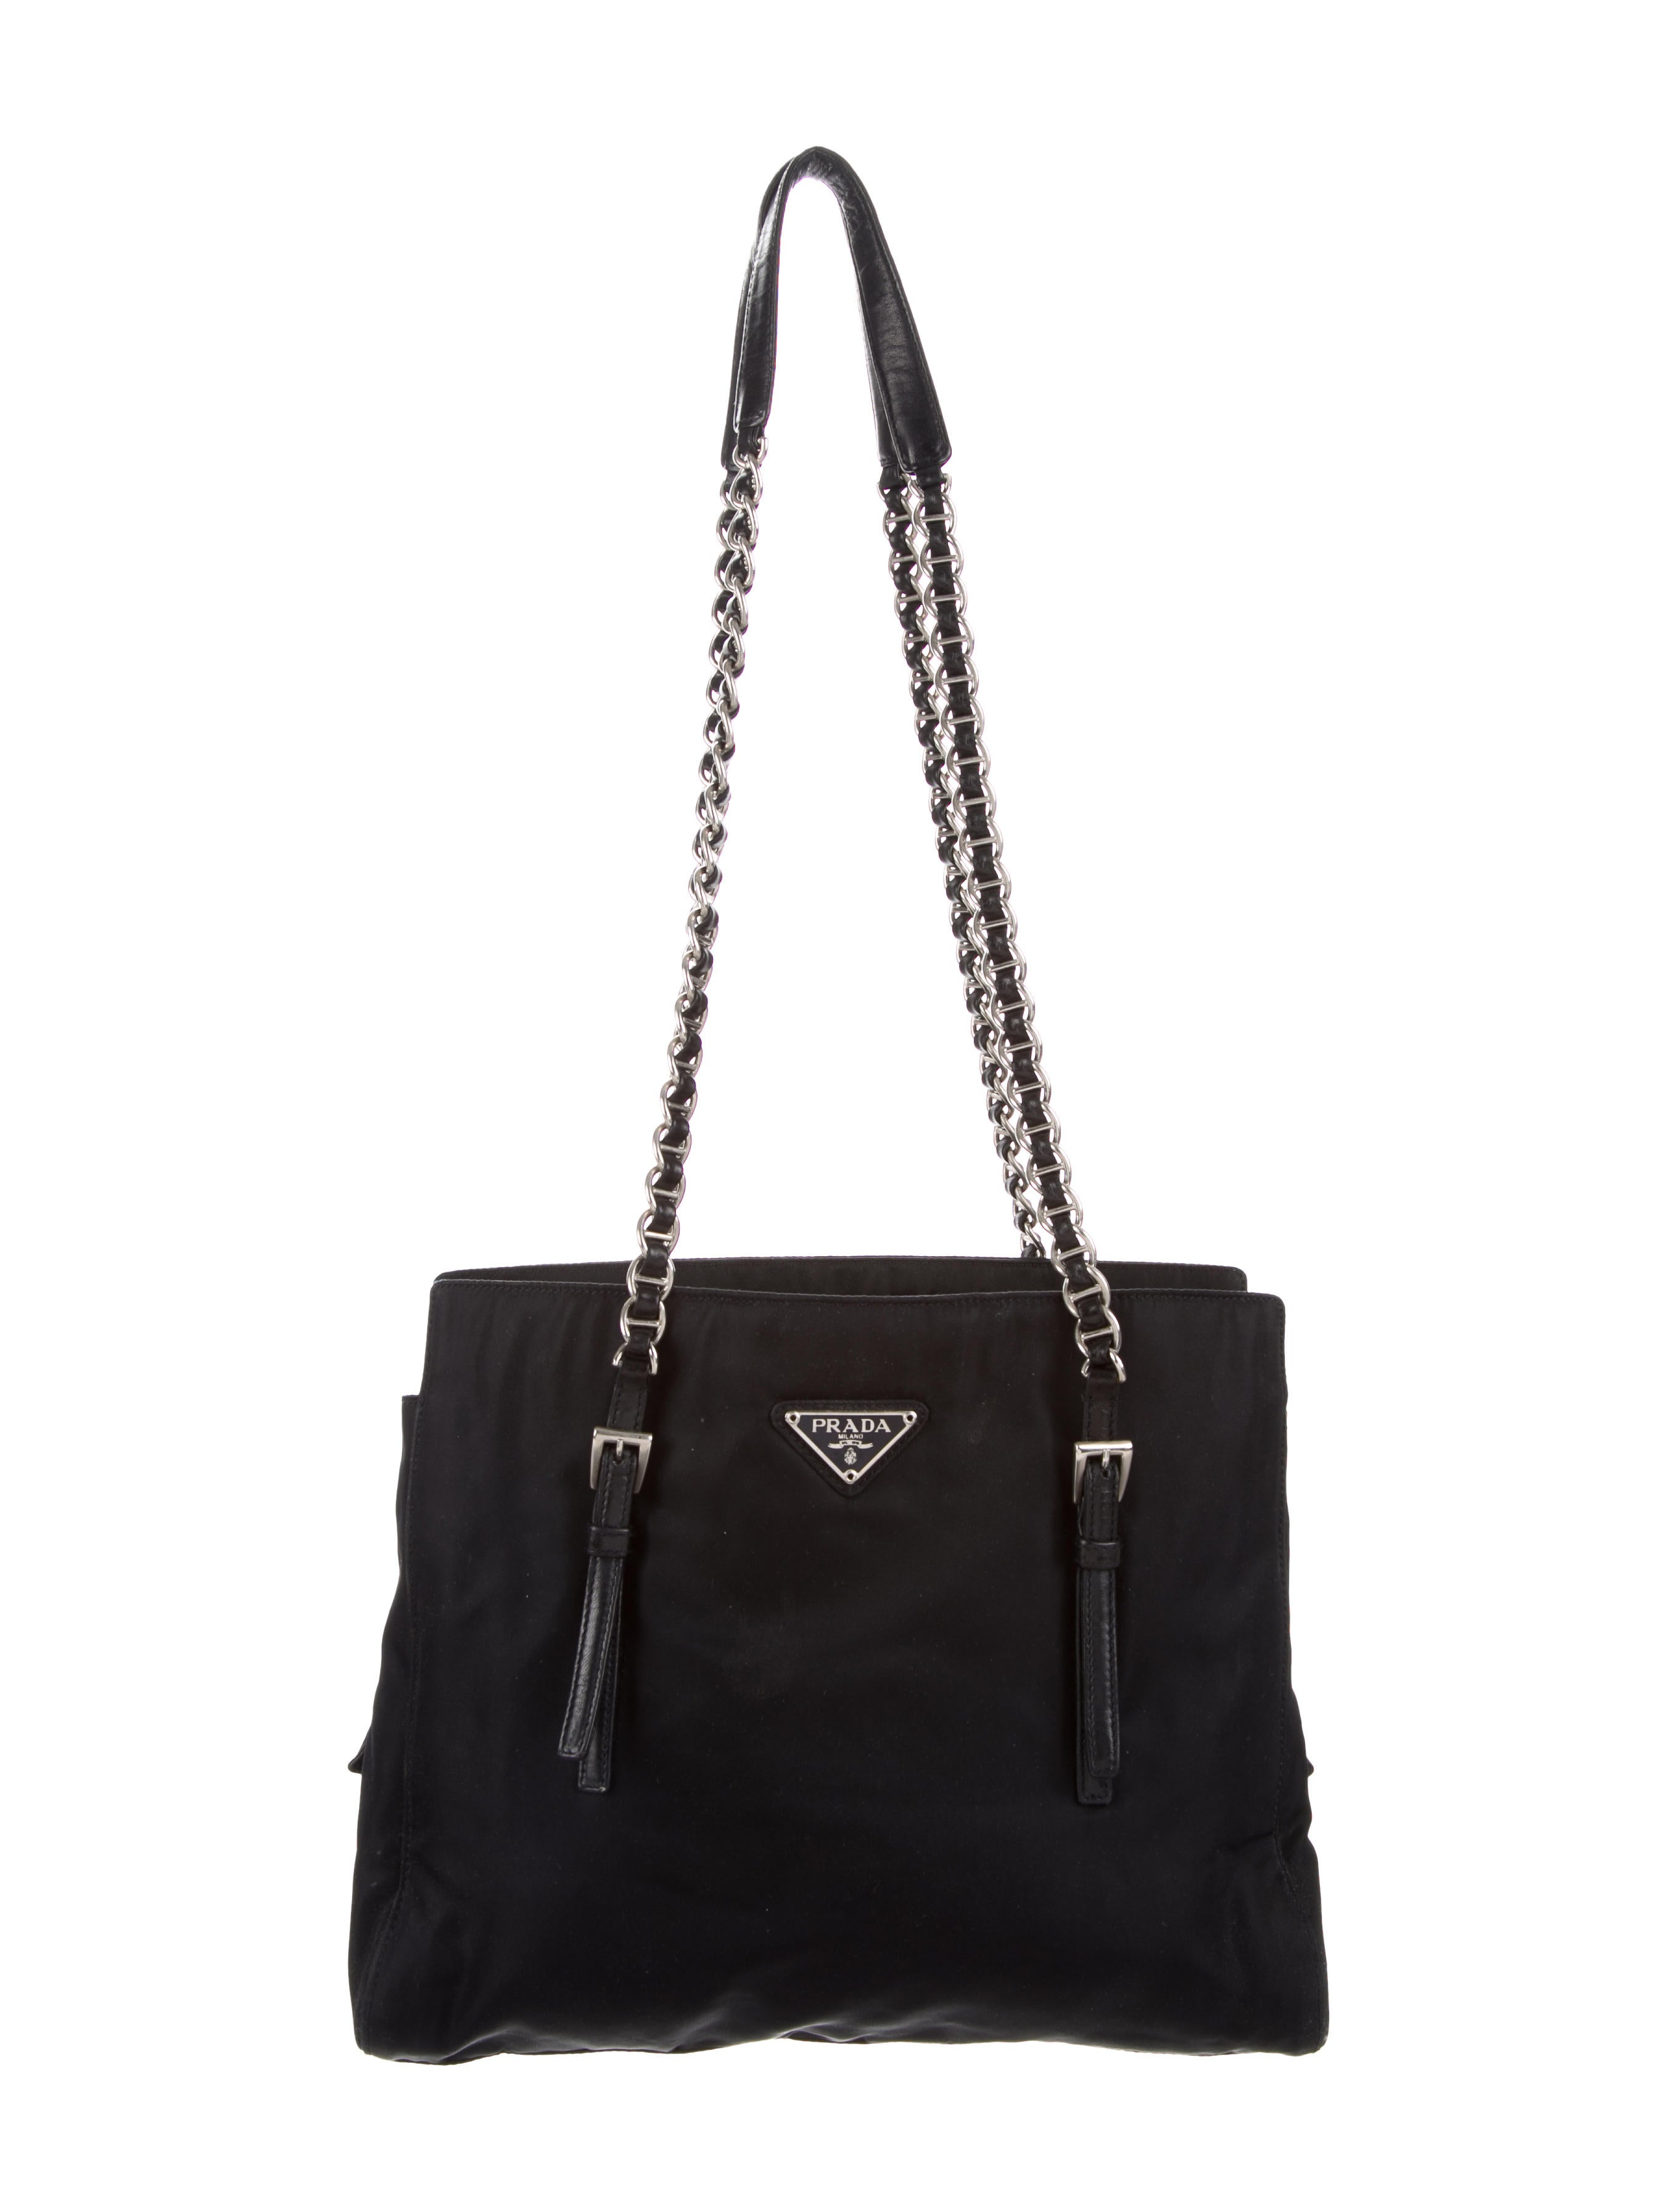 aa2b4b73d5cc ... order where to buy women handbags prada tessuto. tessuto 99ff7 622cd  440e3 bebbe